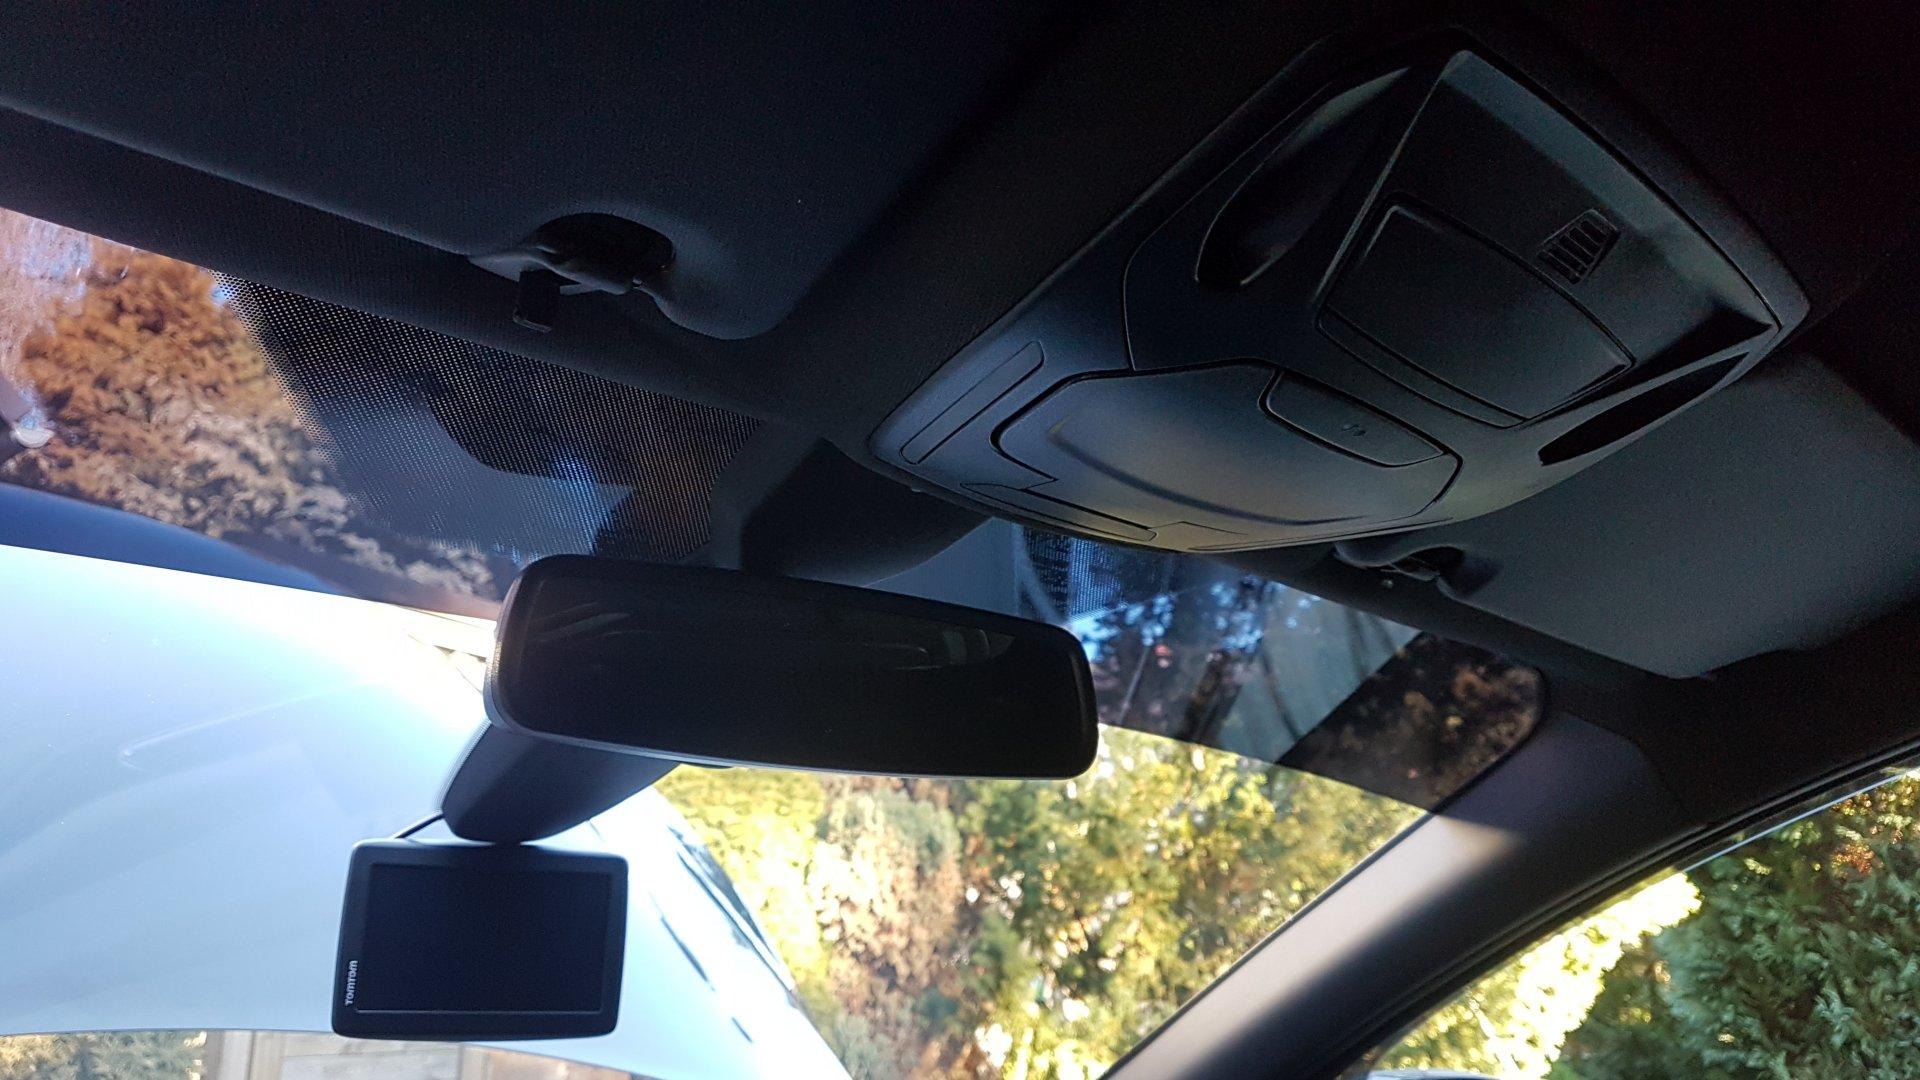 Ford Focus III (2019-02-24) - Innenraum Dachkonsole.jpg